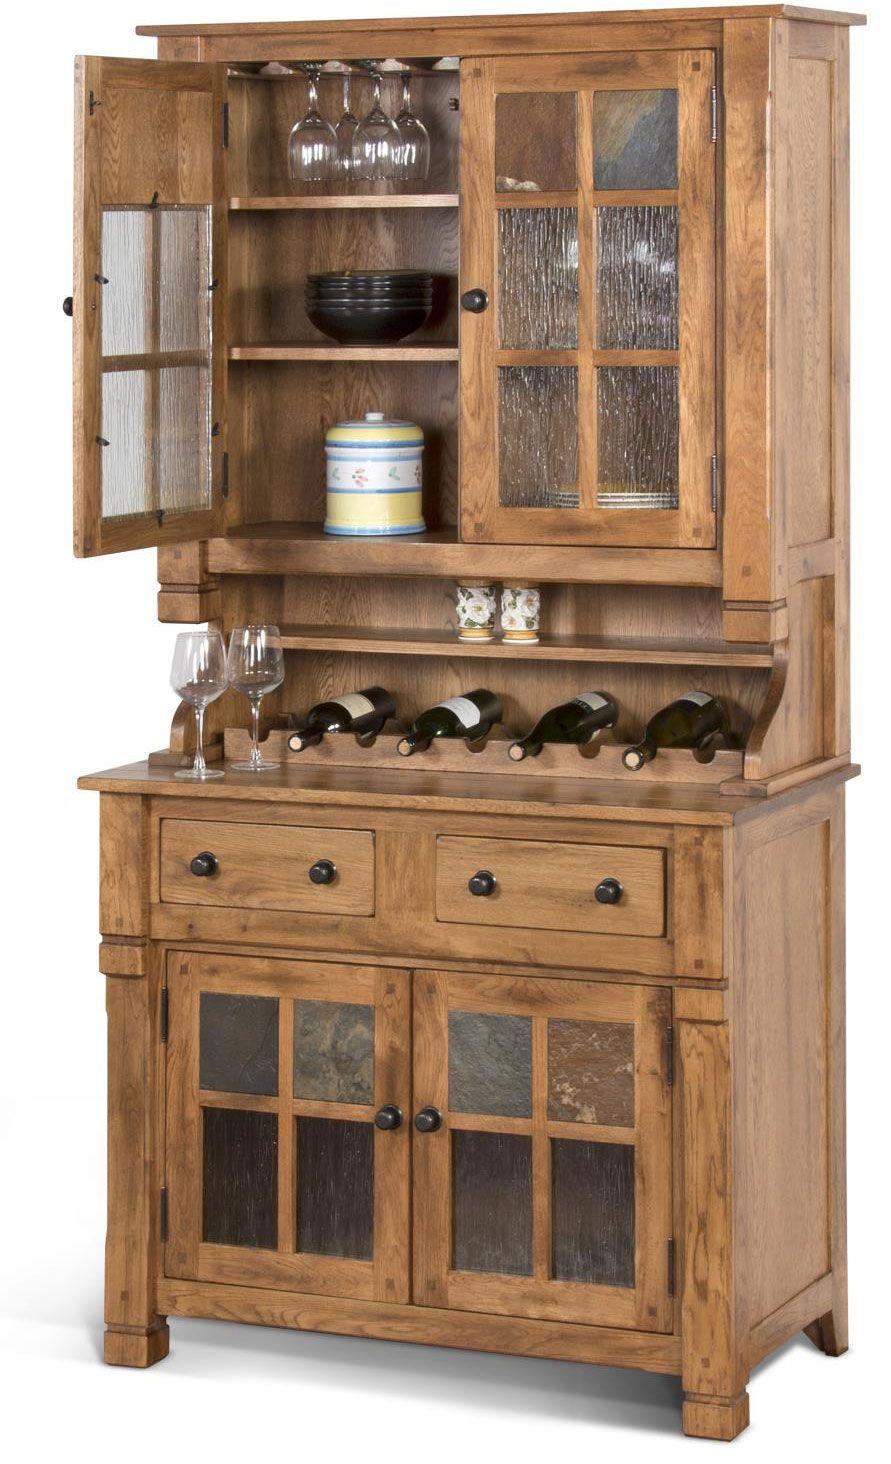 3 Door Hutches Dining Room Furniture Amish Oak In Texas Mission Furniture Mission Style Furniture Furniture